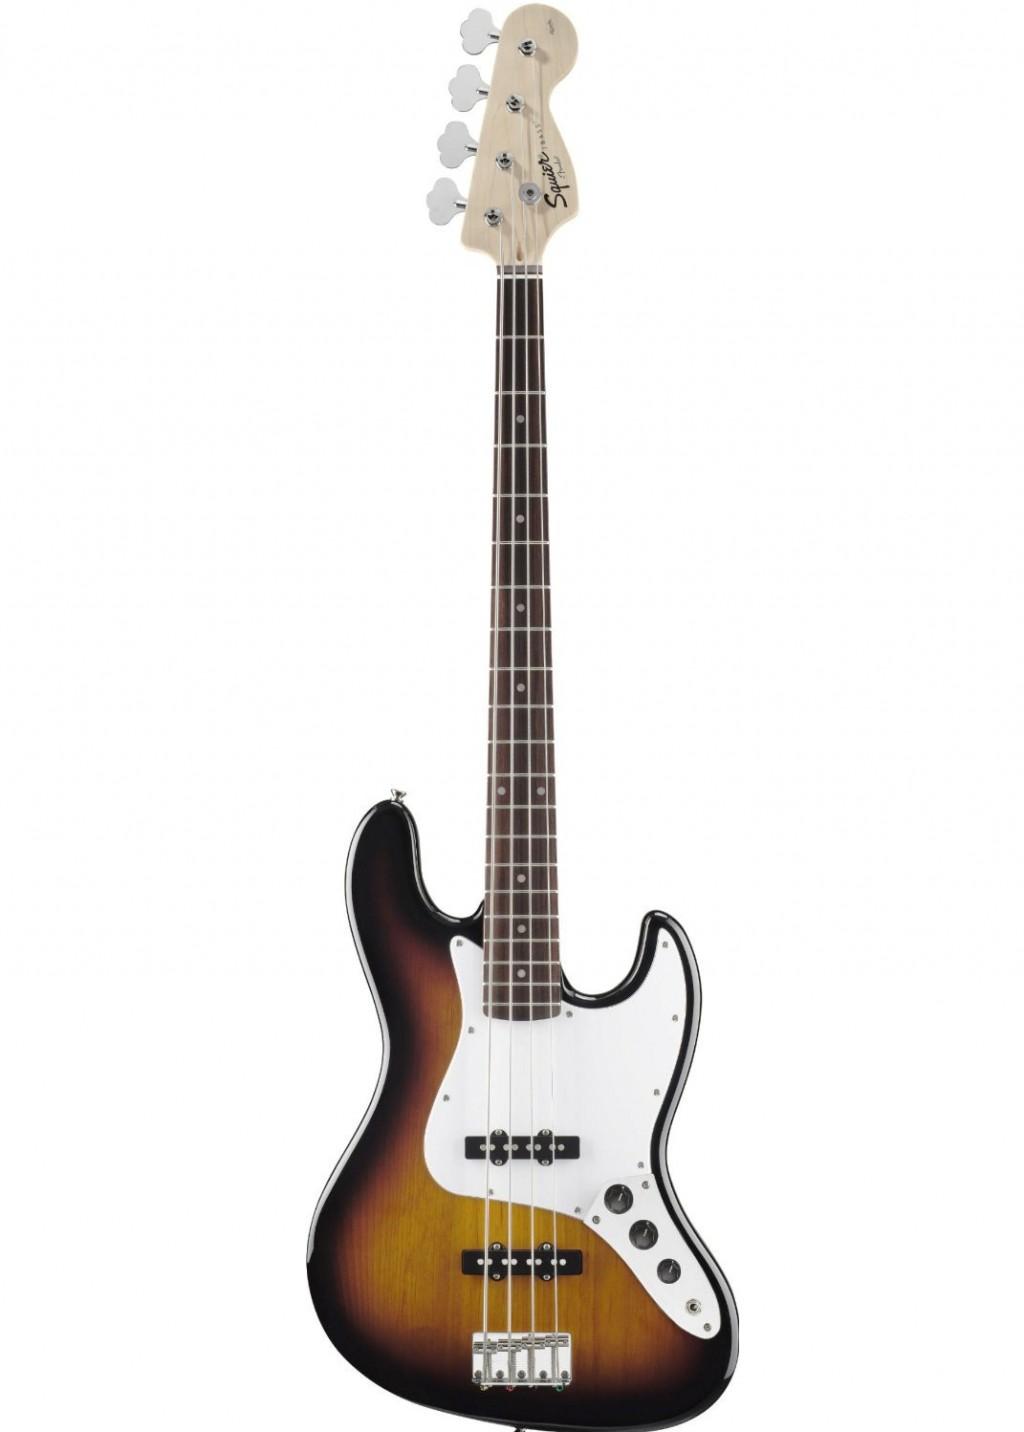 top 5 best beginner bass guitars under 200 spinditty. Black Bedroom Furniture Sets. Home Design Ideas